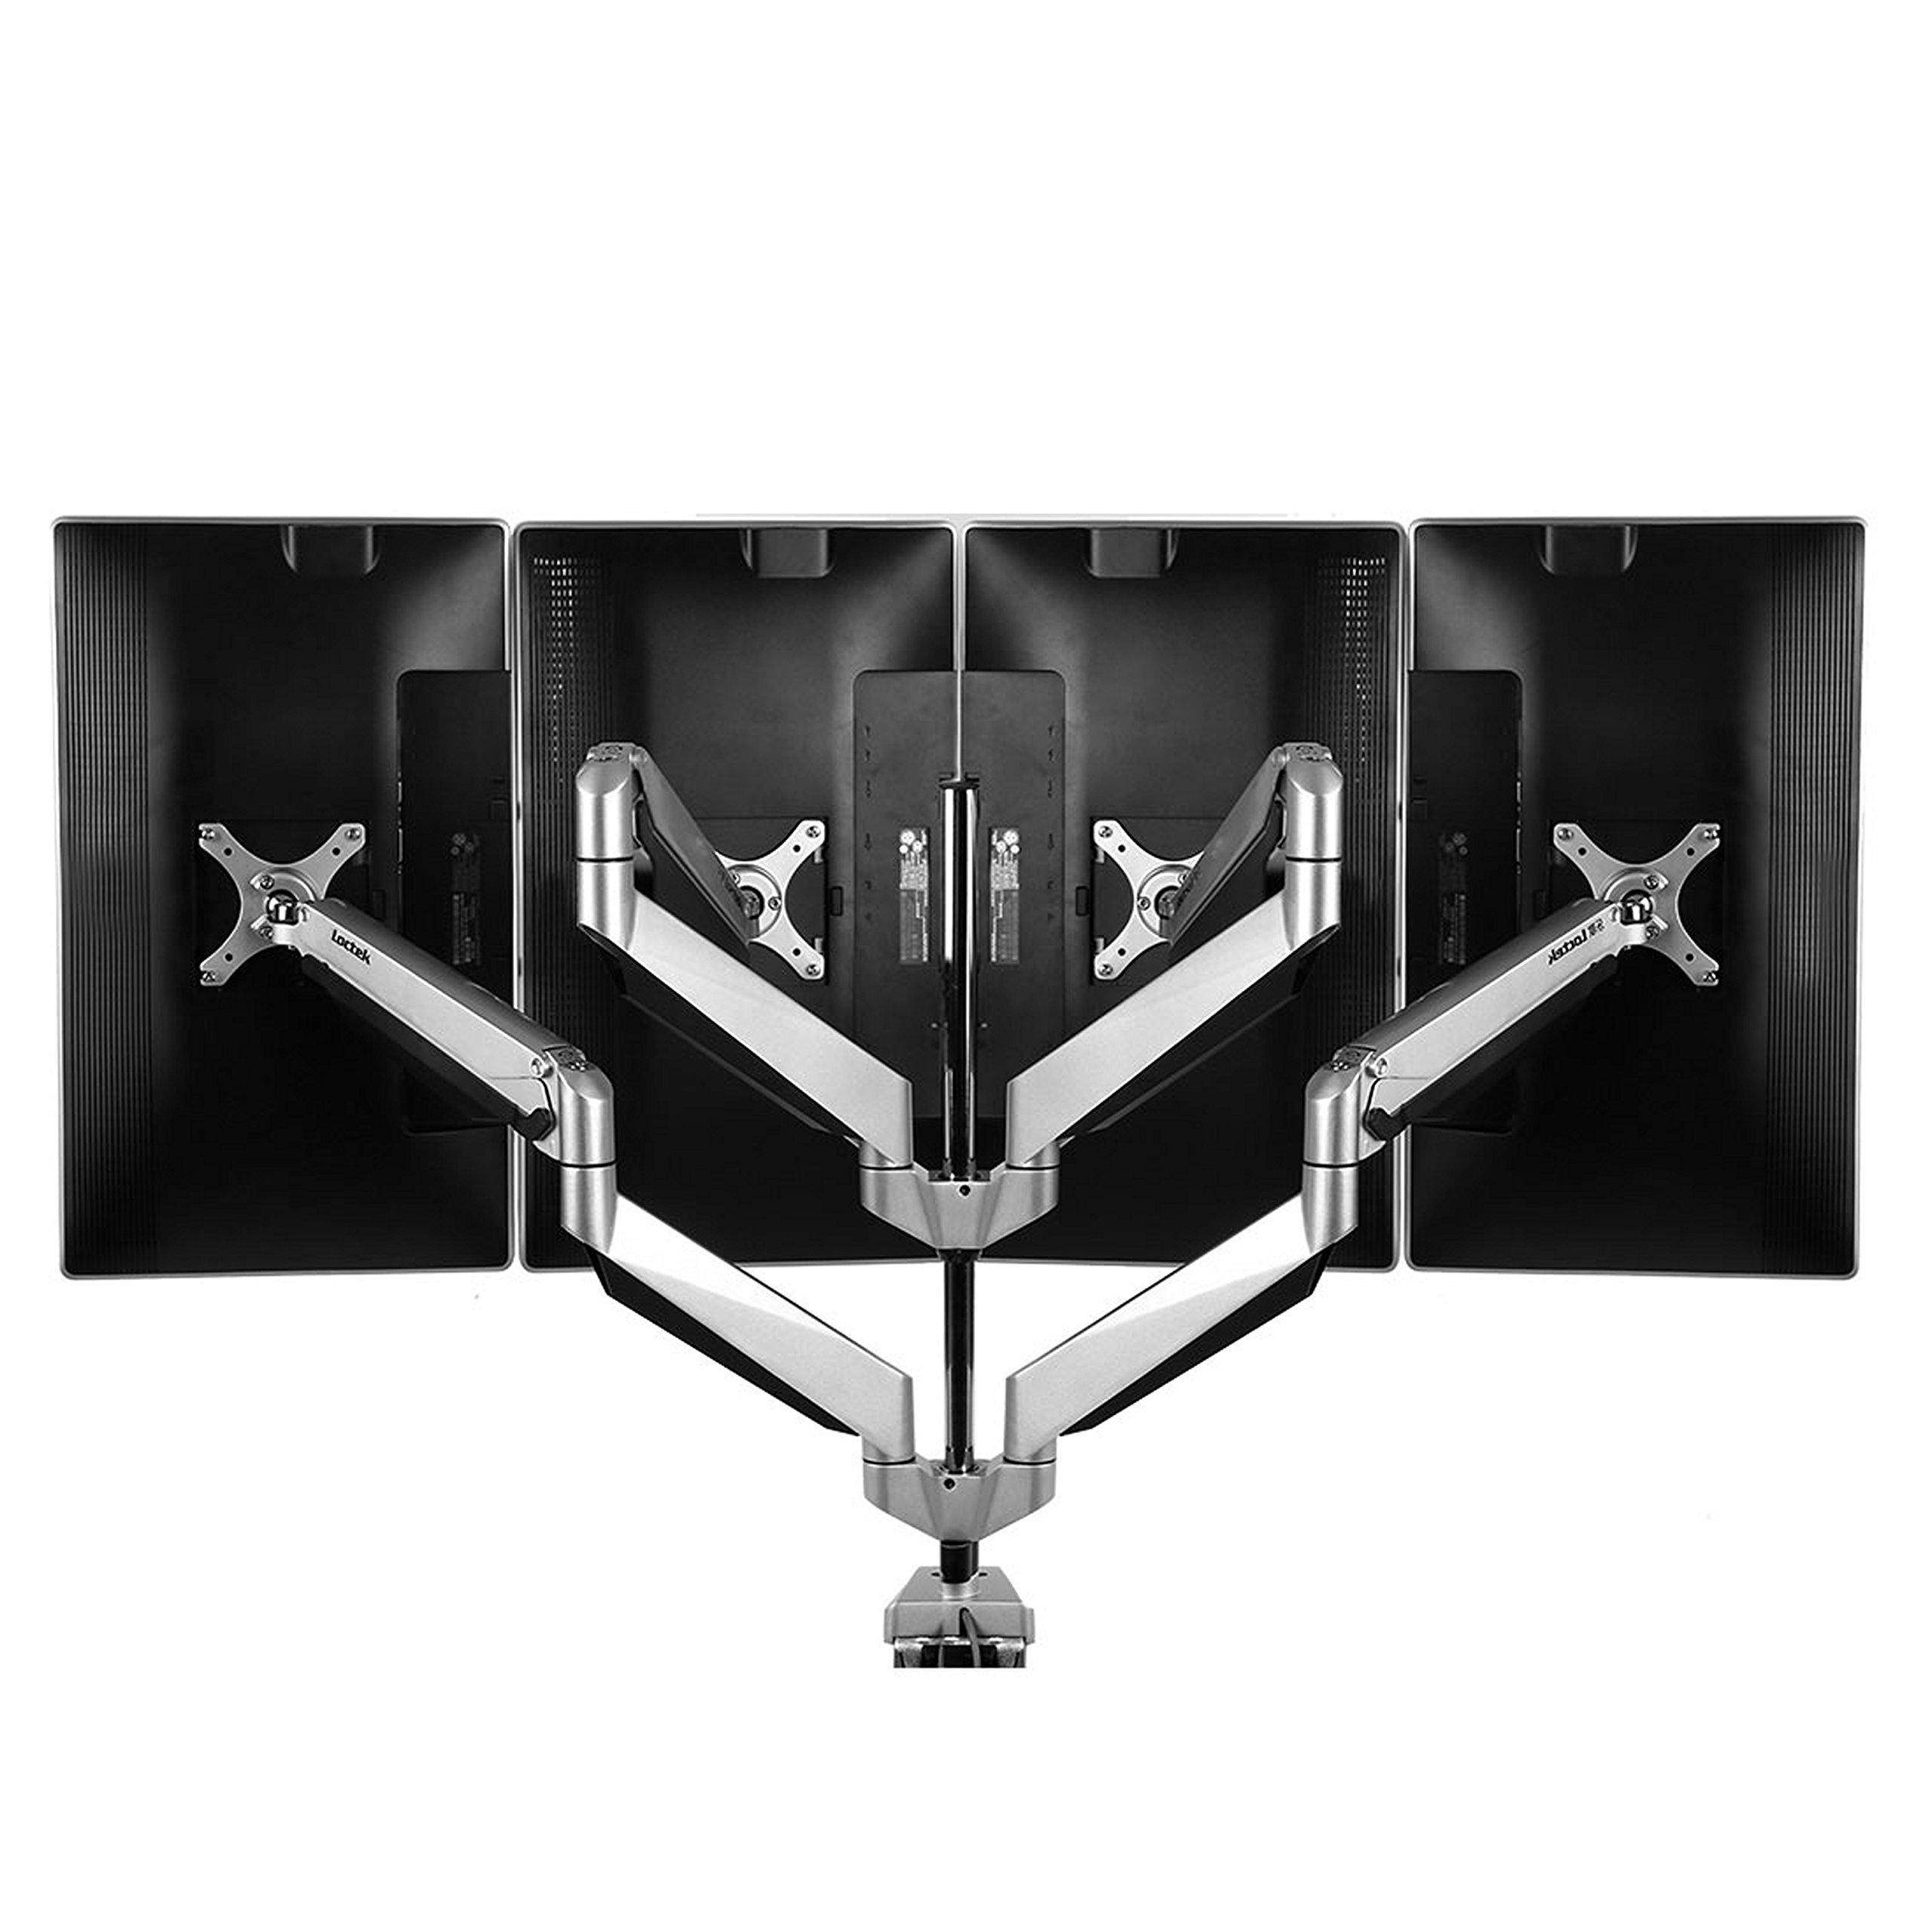 Loctek D7Q Swivel Quad Arm Monitor Mounts Stand for 10''-27'' Computer Screen, Ergonomic Heavy Duty Height Adjustable Desk Mount by Loctek (Image #1)